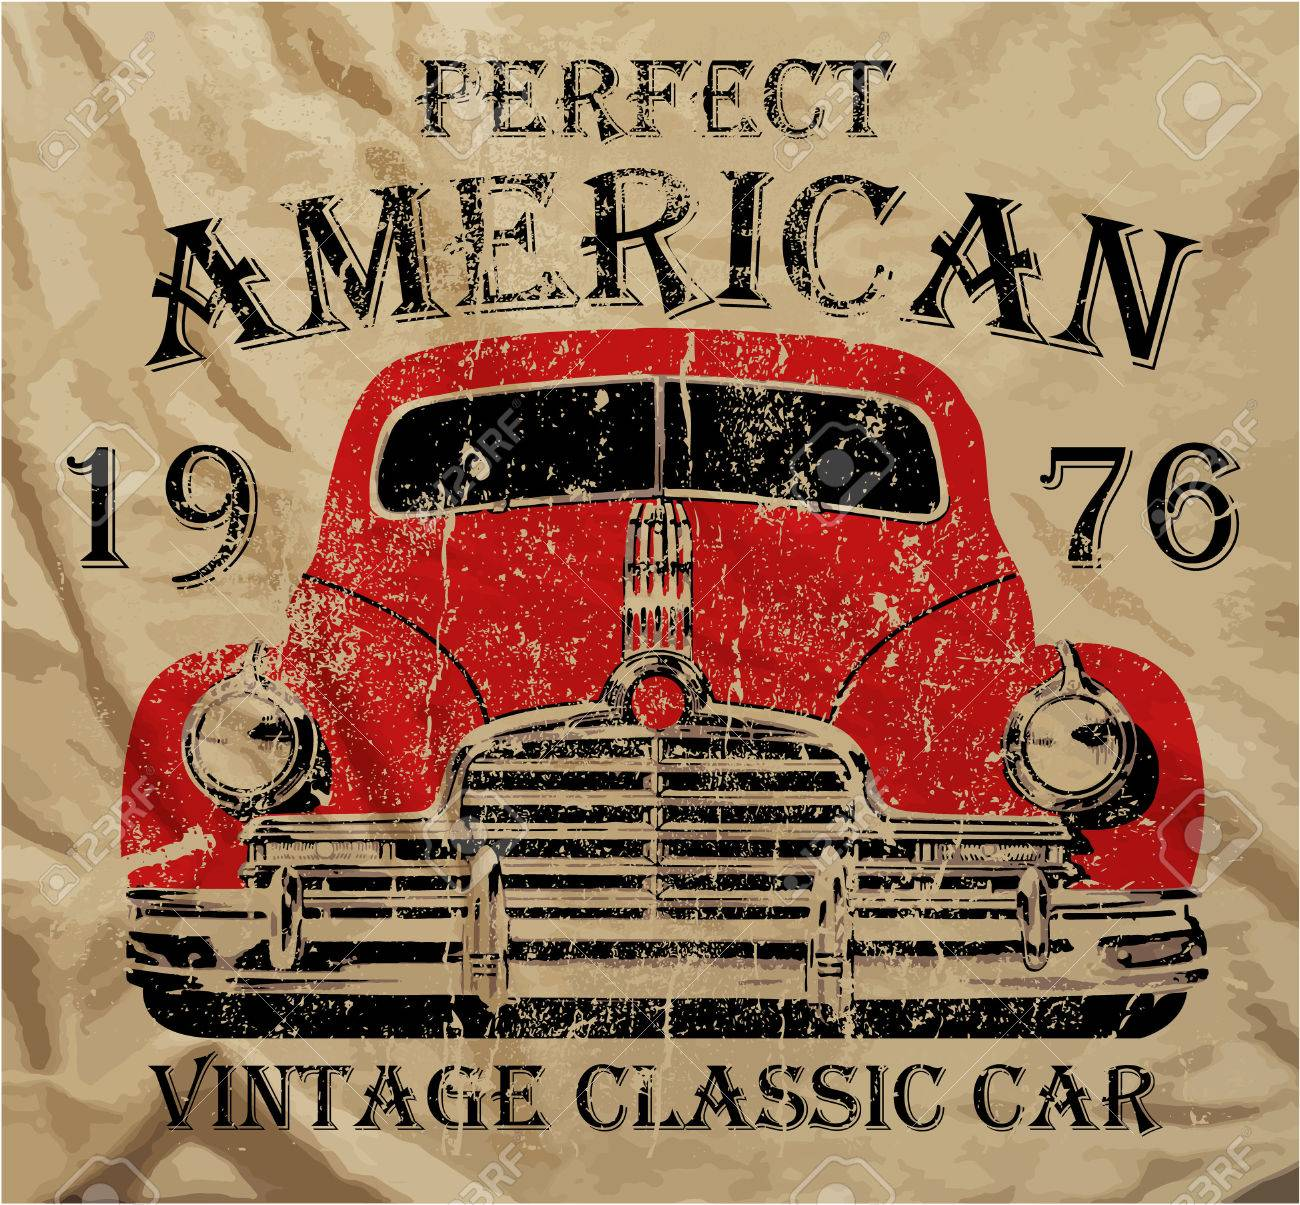 Old American Car Vintage Classic Retro Man T Shirt Graphic Design ...